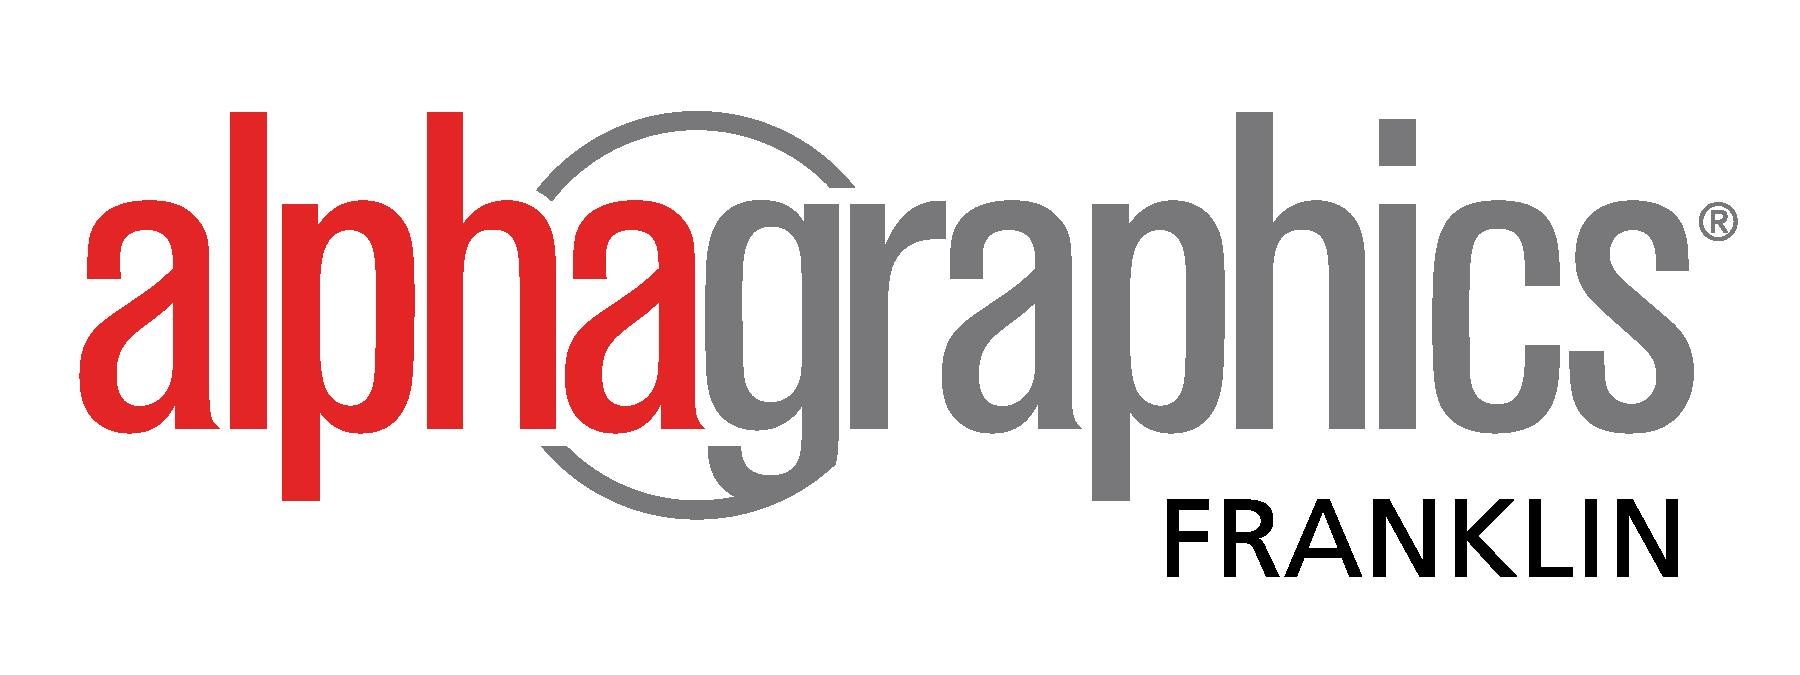 AlphaGraphics Franklin_Logo.png